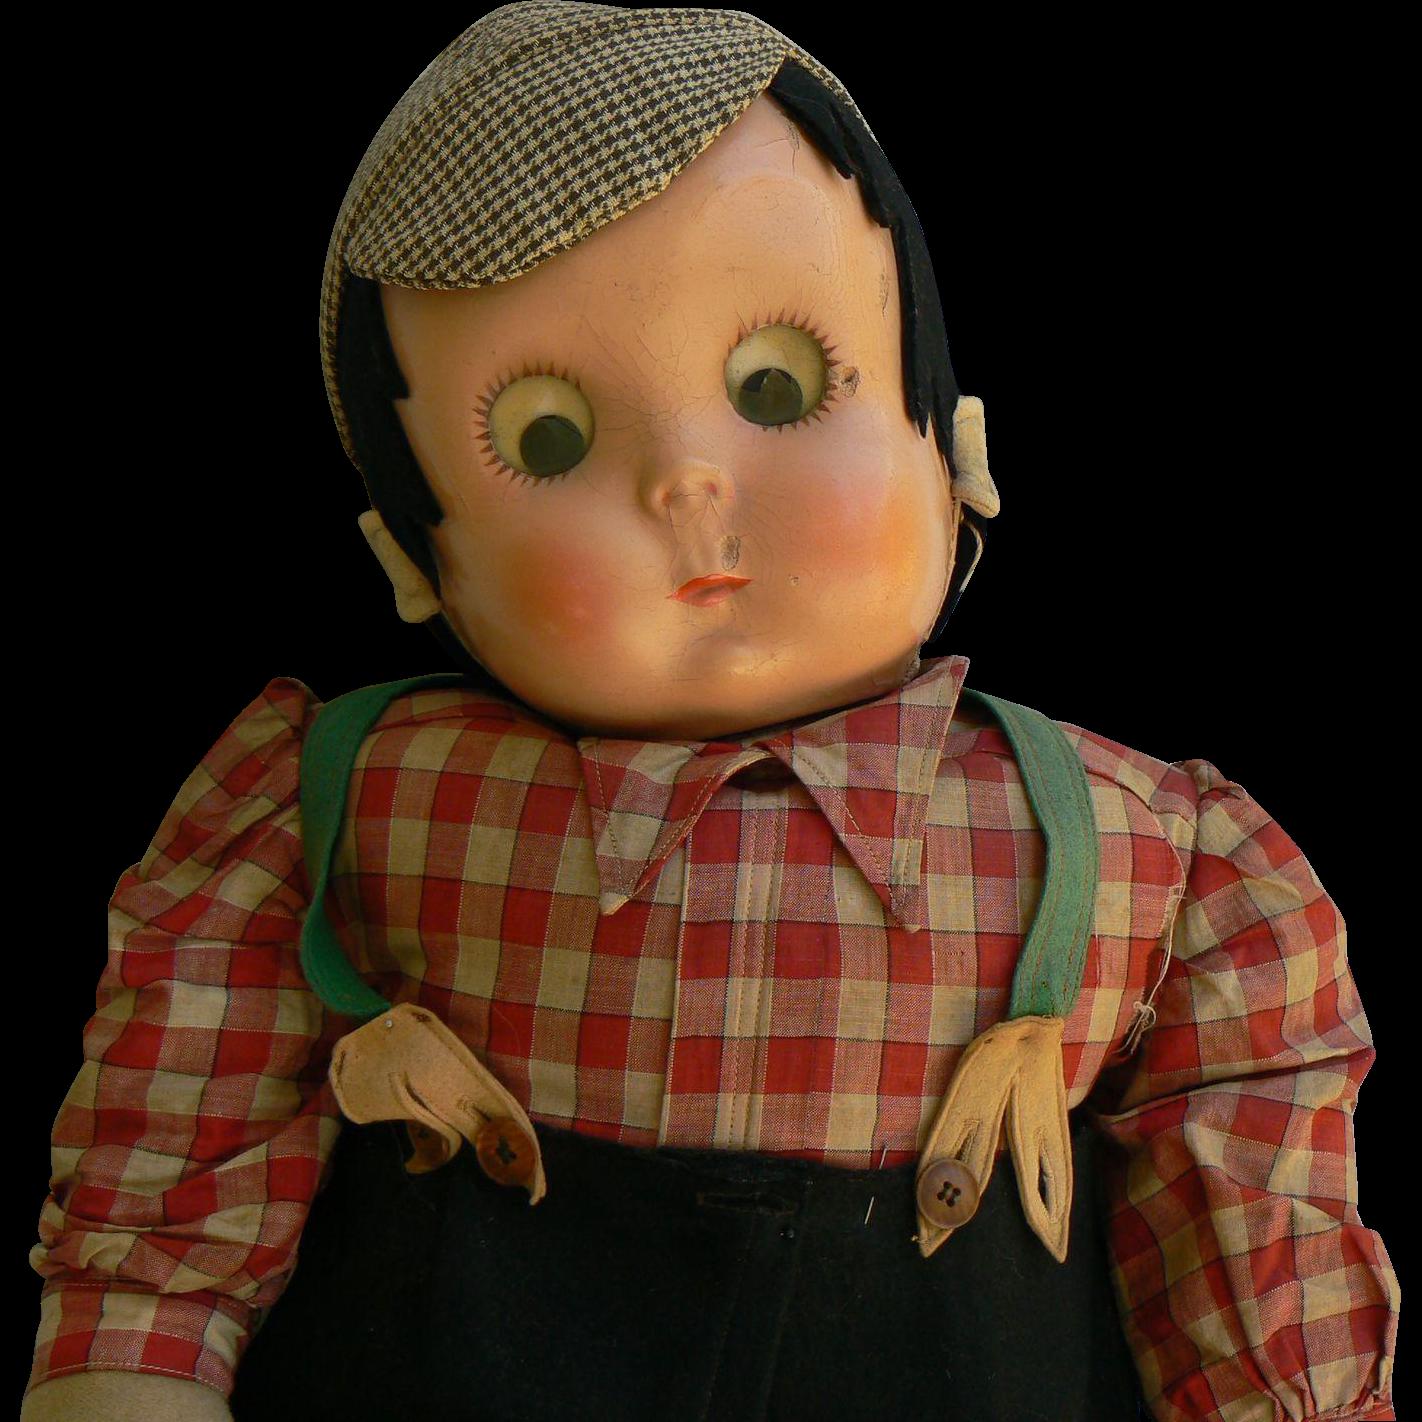 Rare Lenci Mask Face Disc eyes boy doll well loved 1930's 40's.